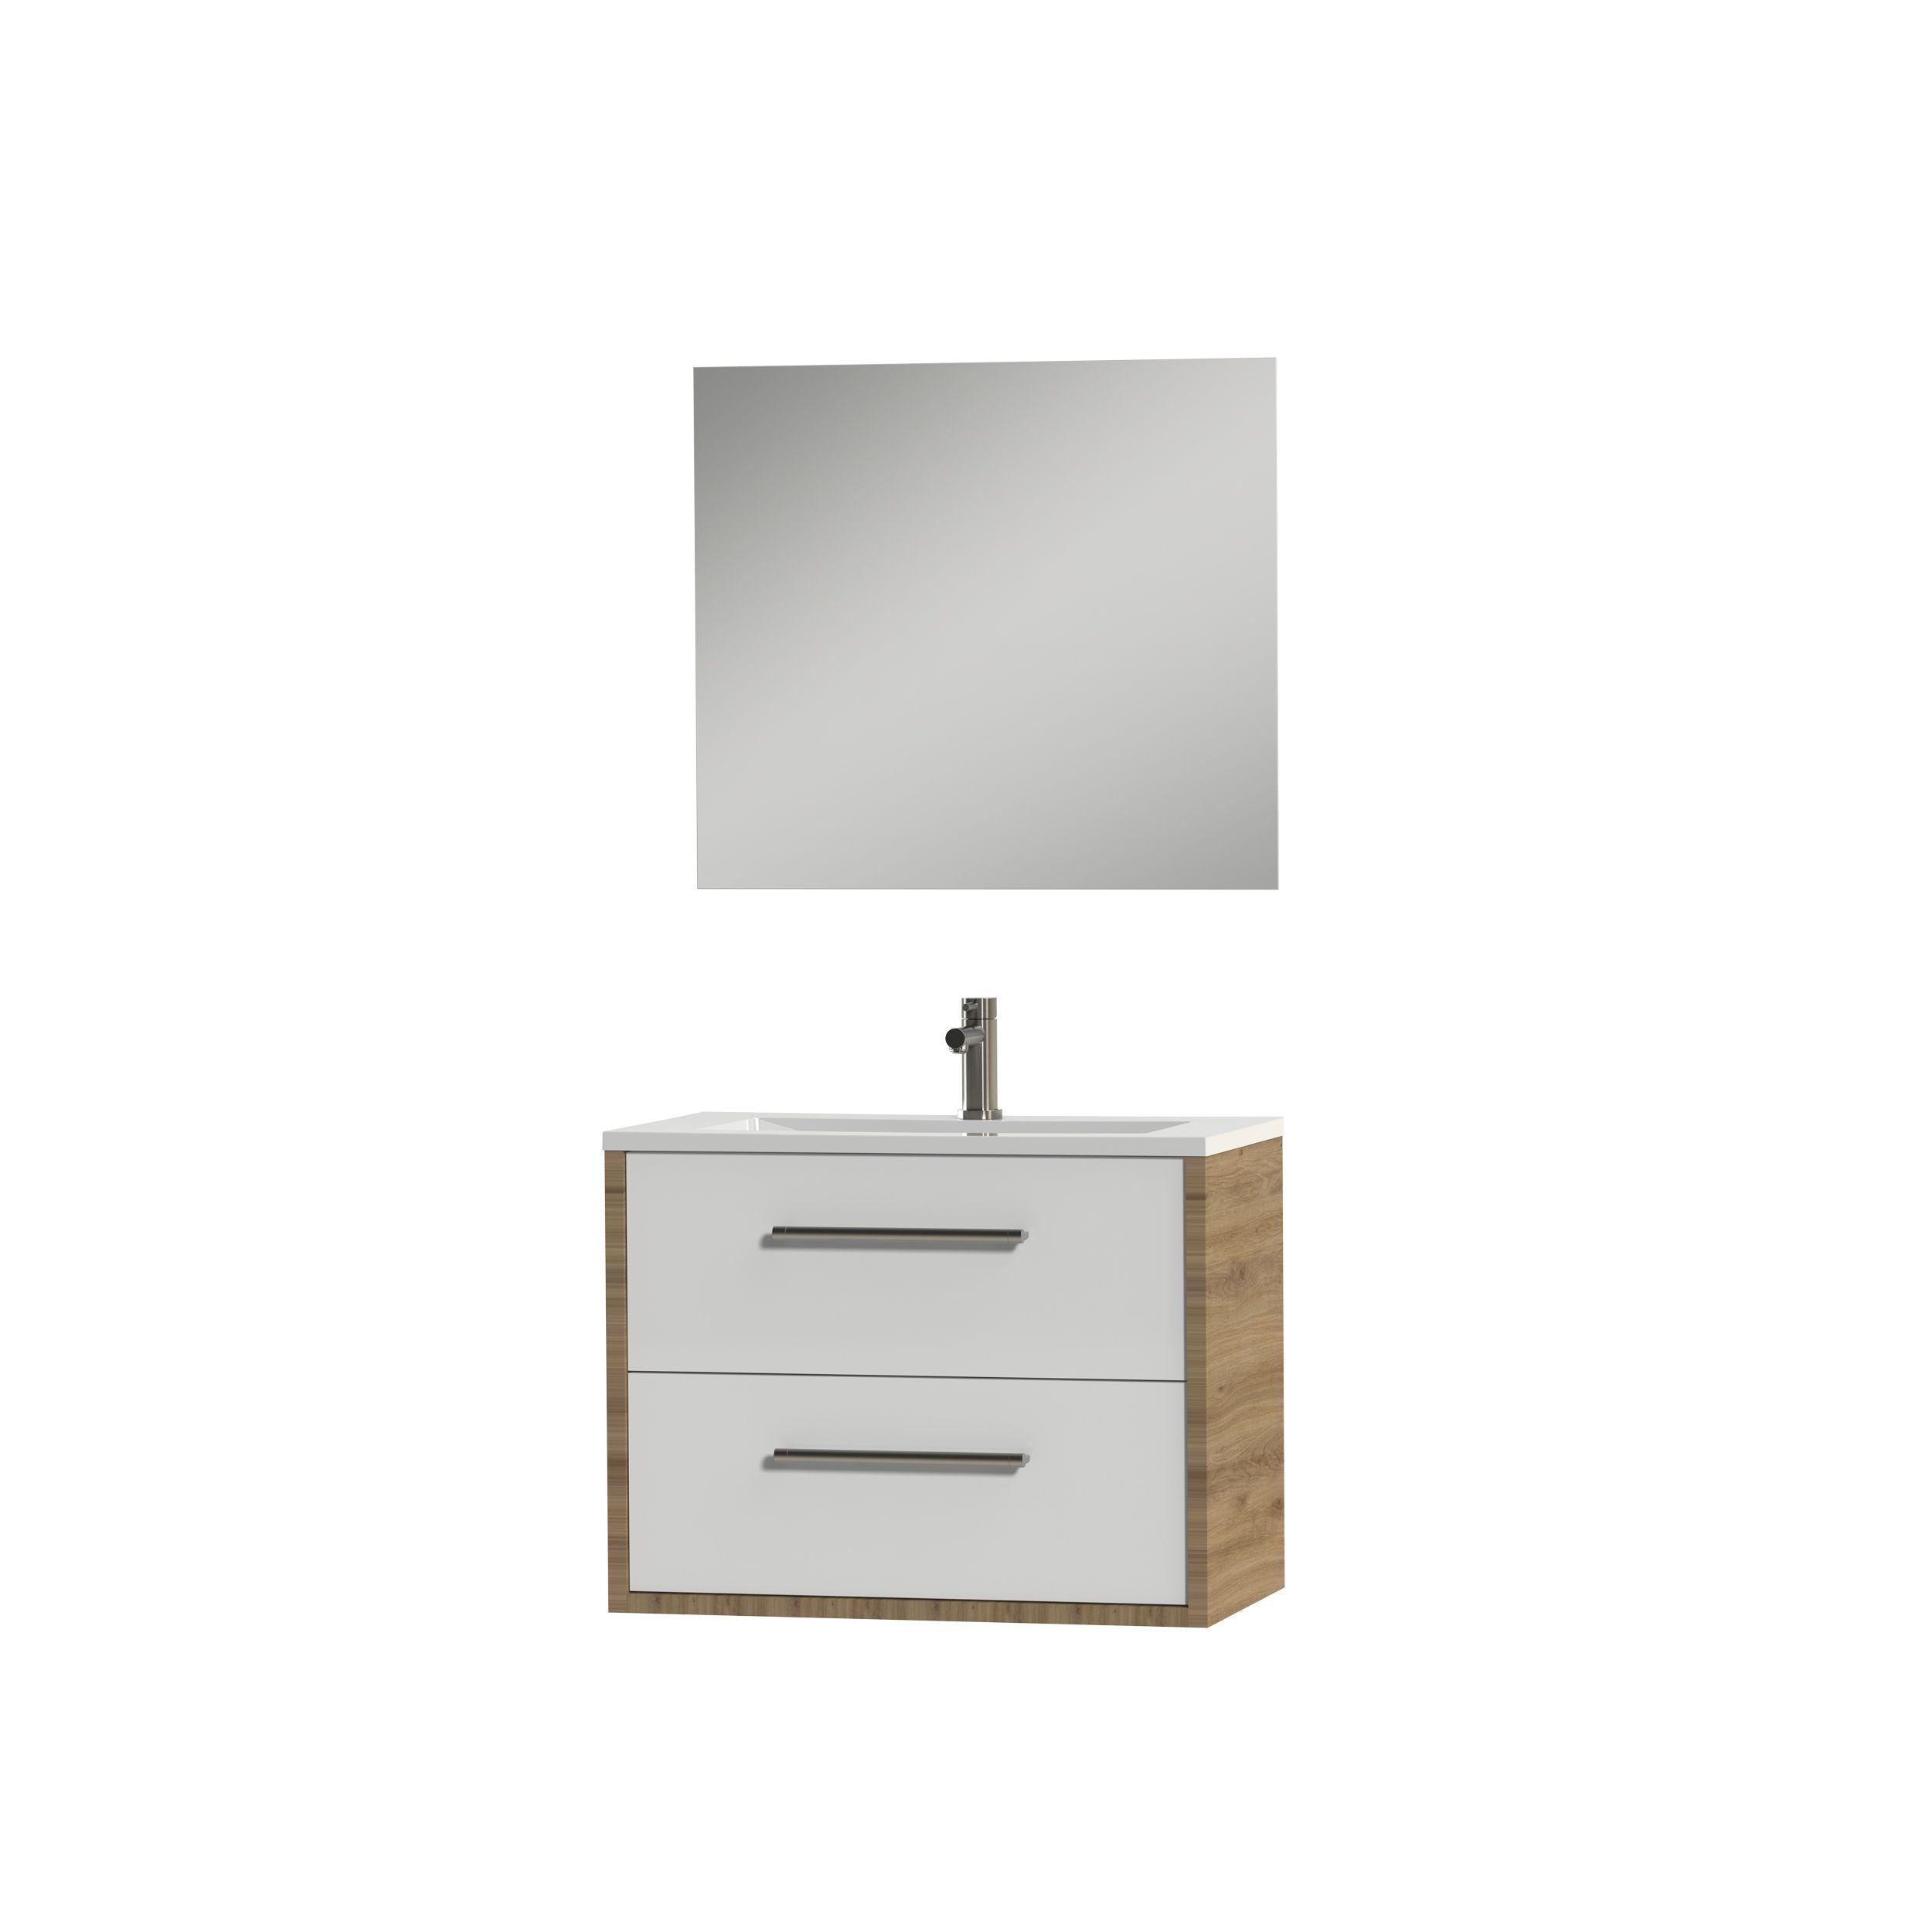 Tiger Boston badmeubelset incl spiegel en witte wastafel 80cm chalet eiken